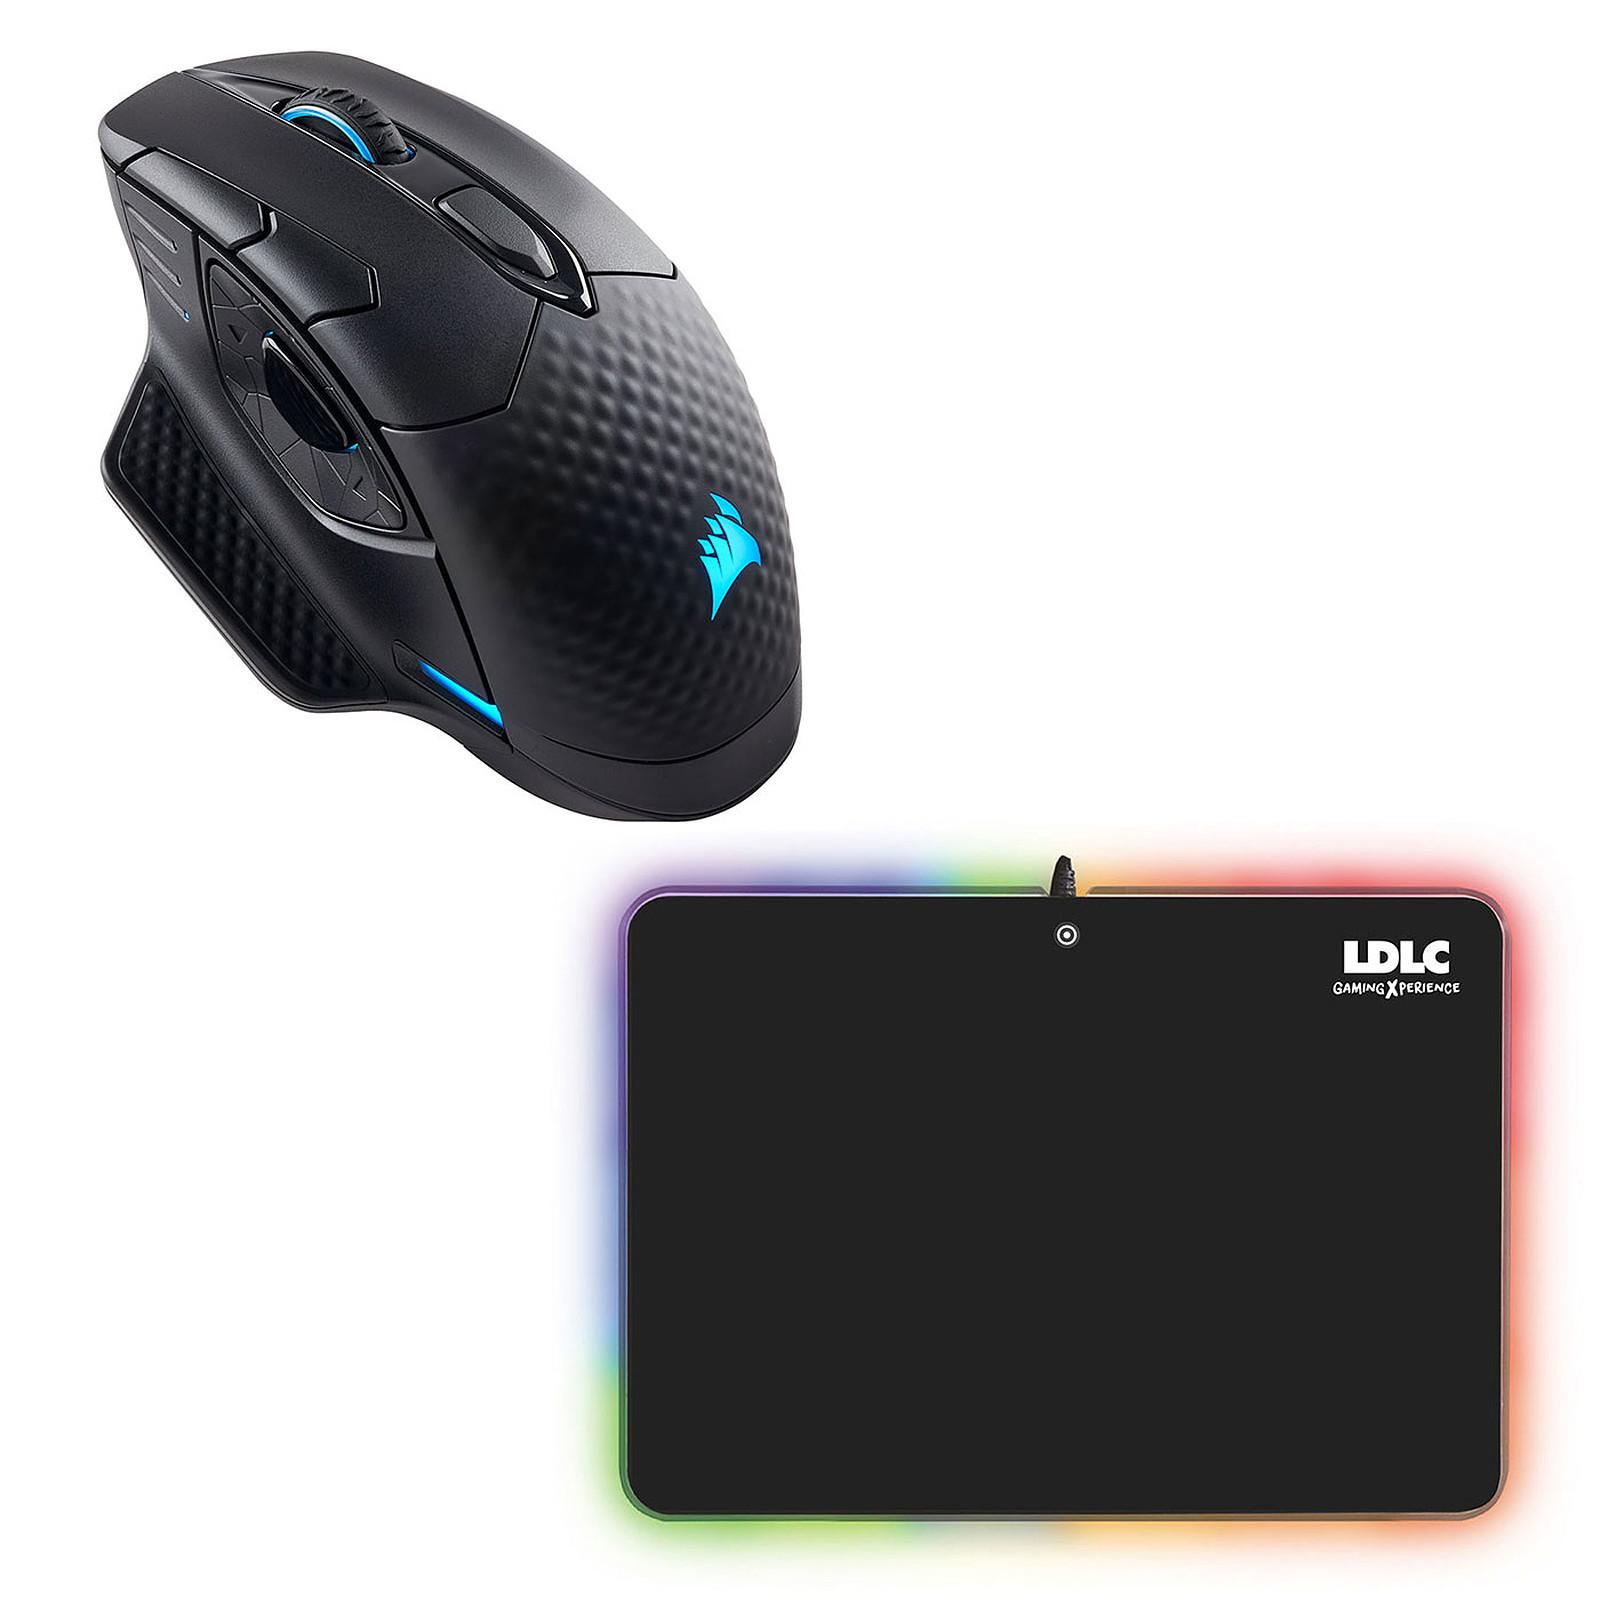 Corsair Dark Core RGB + LDLC RGB PAD